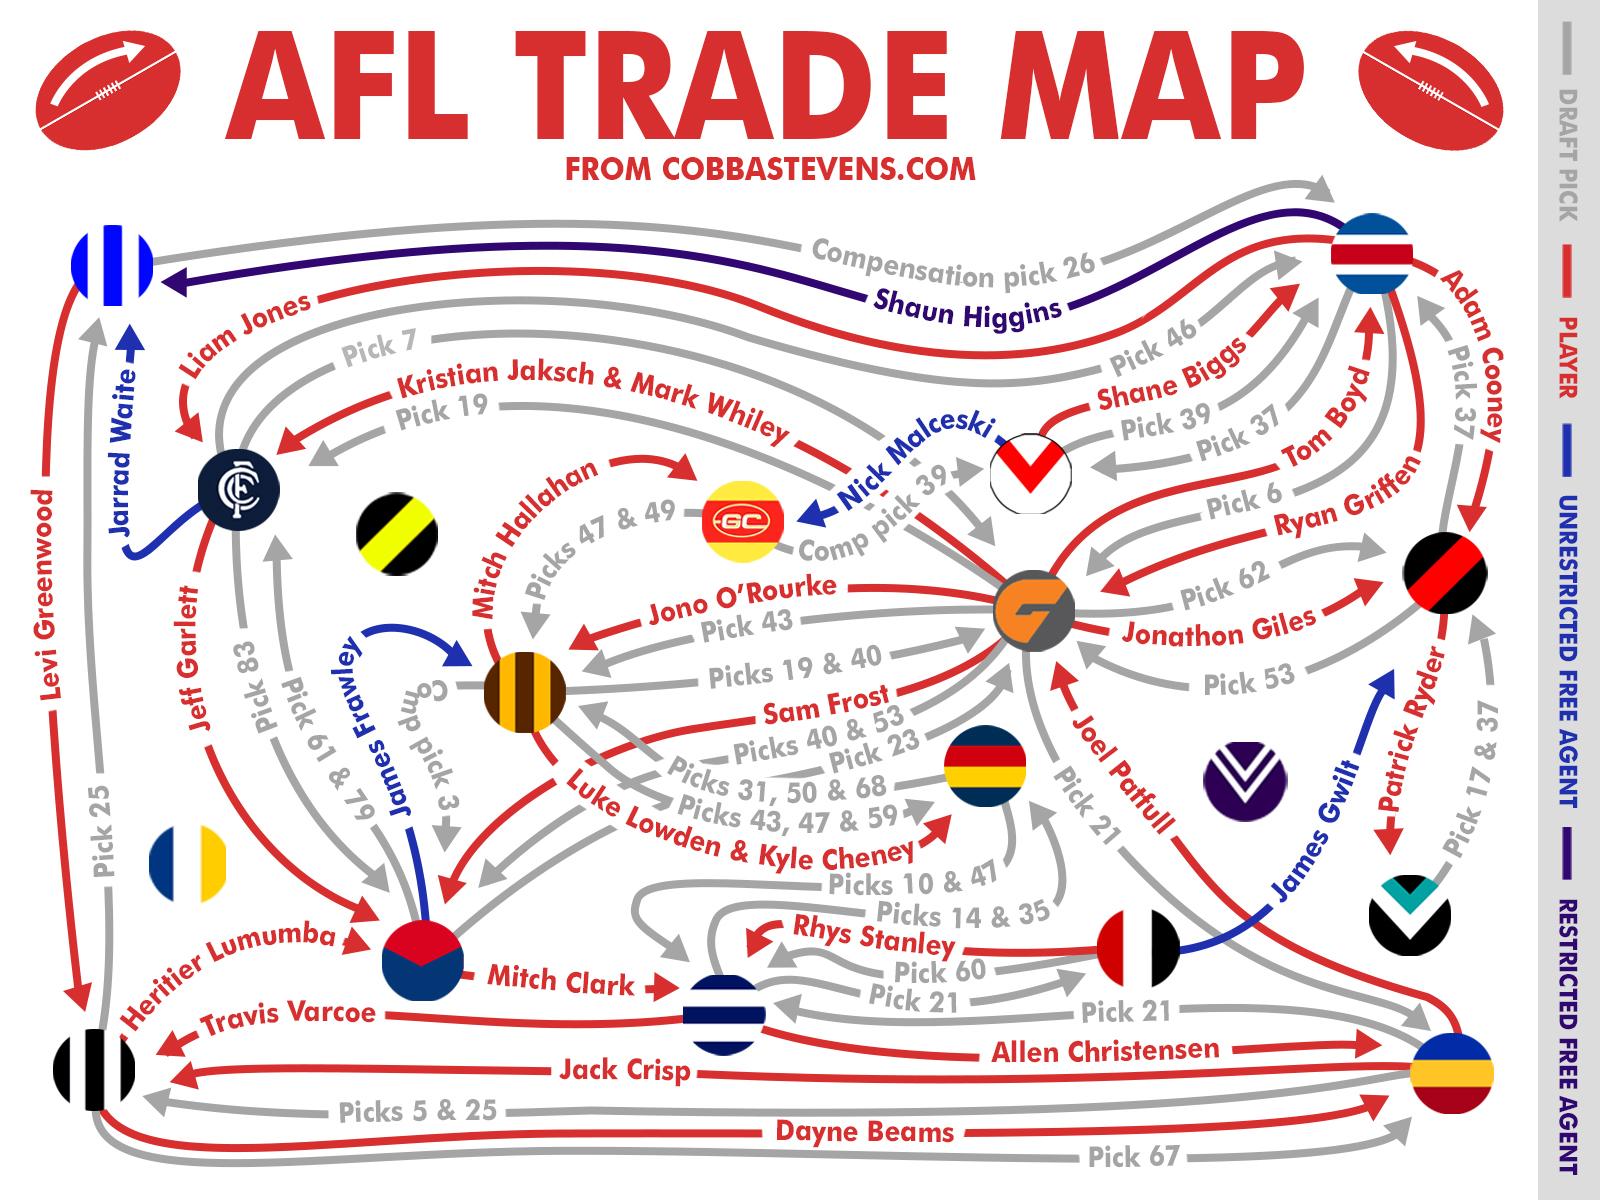 afl trade - photo #2